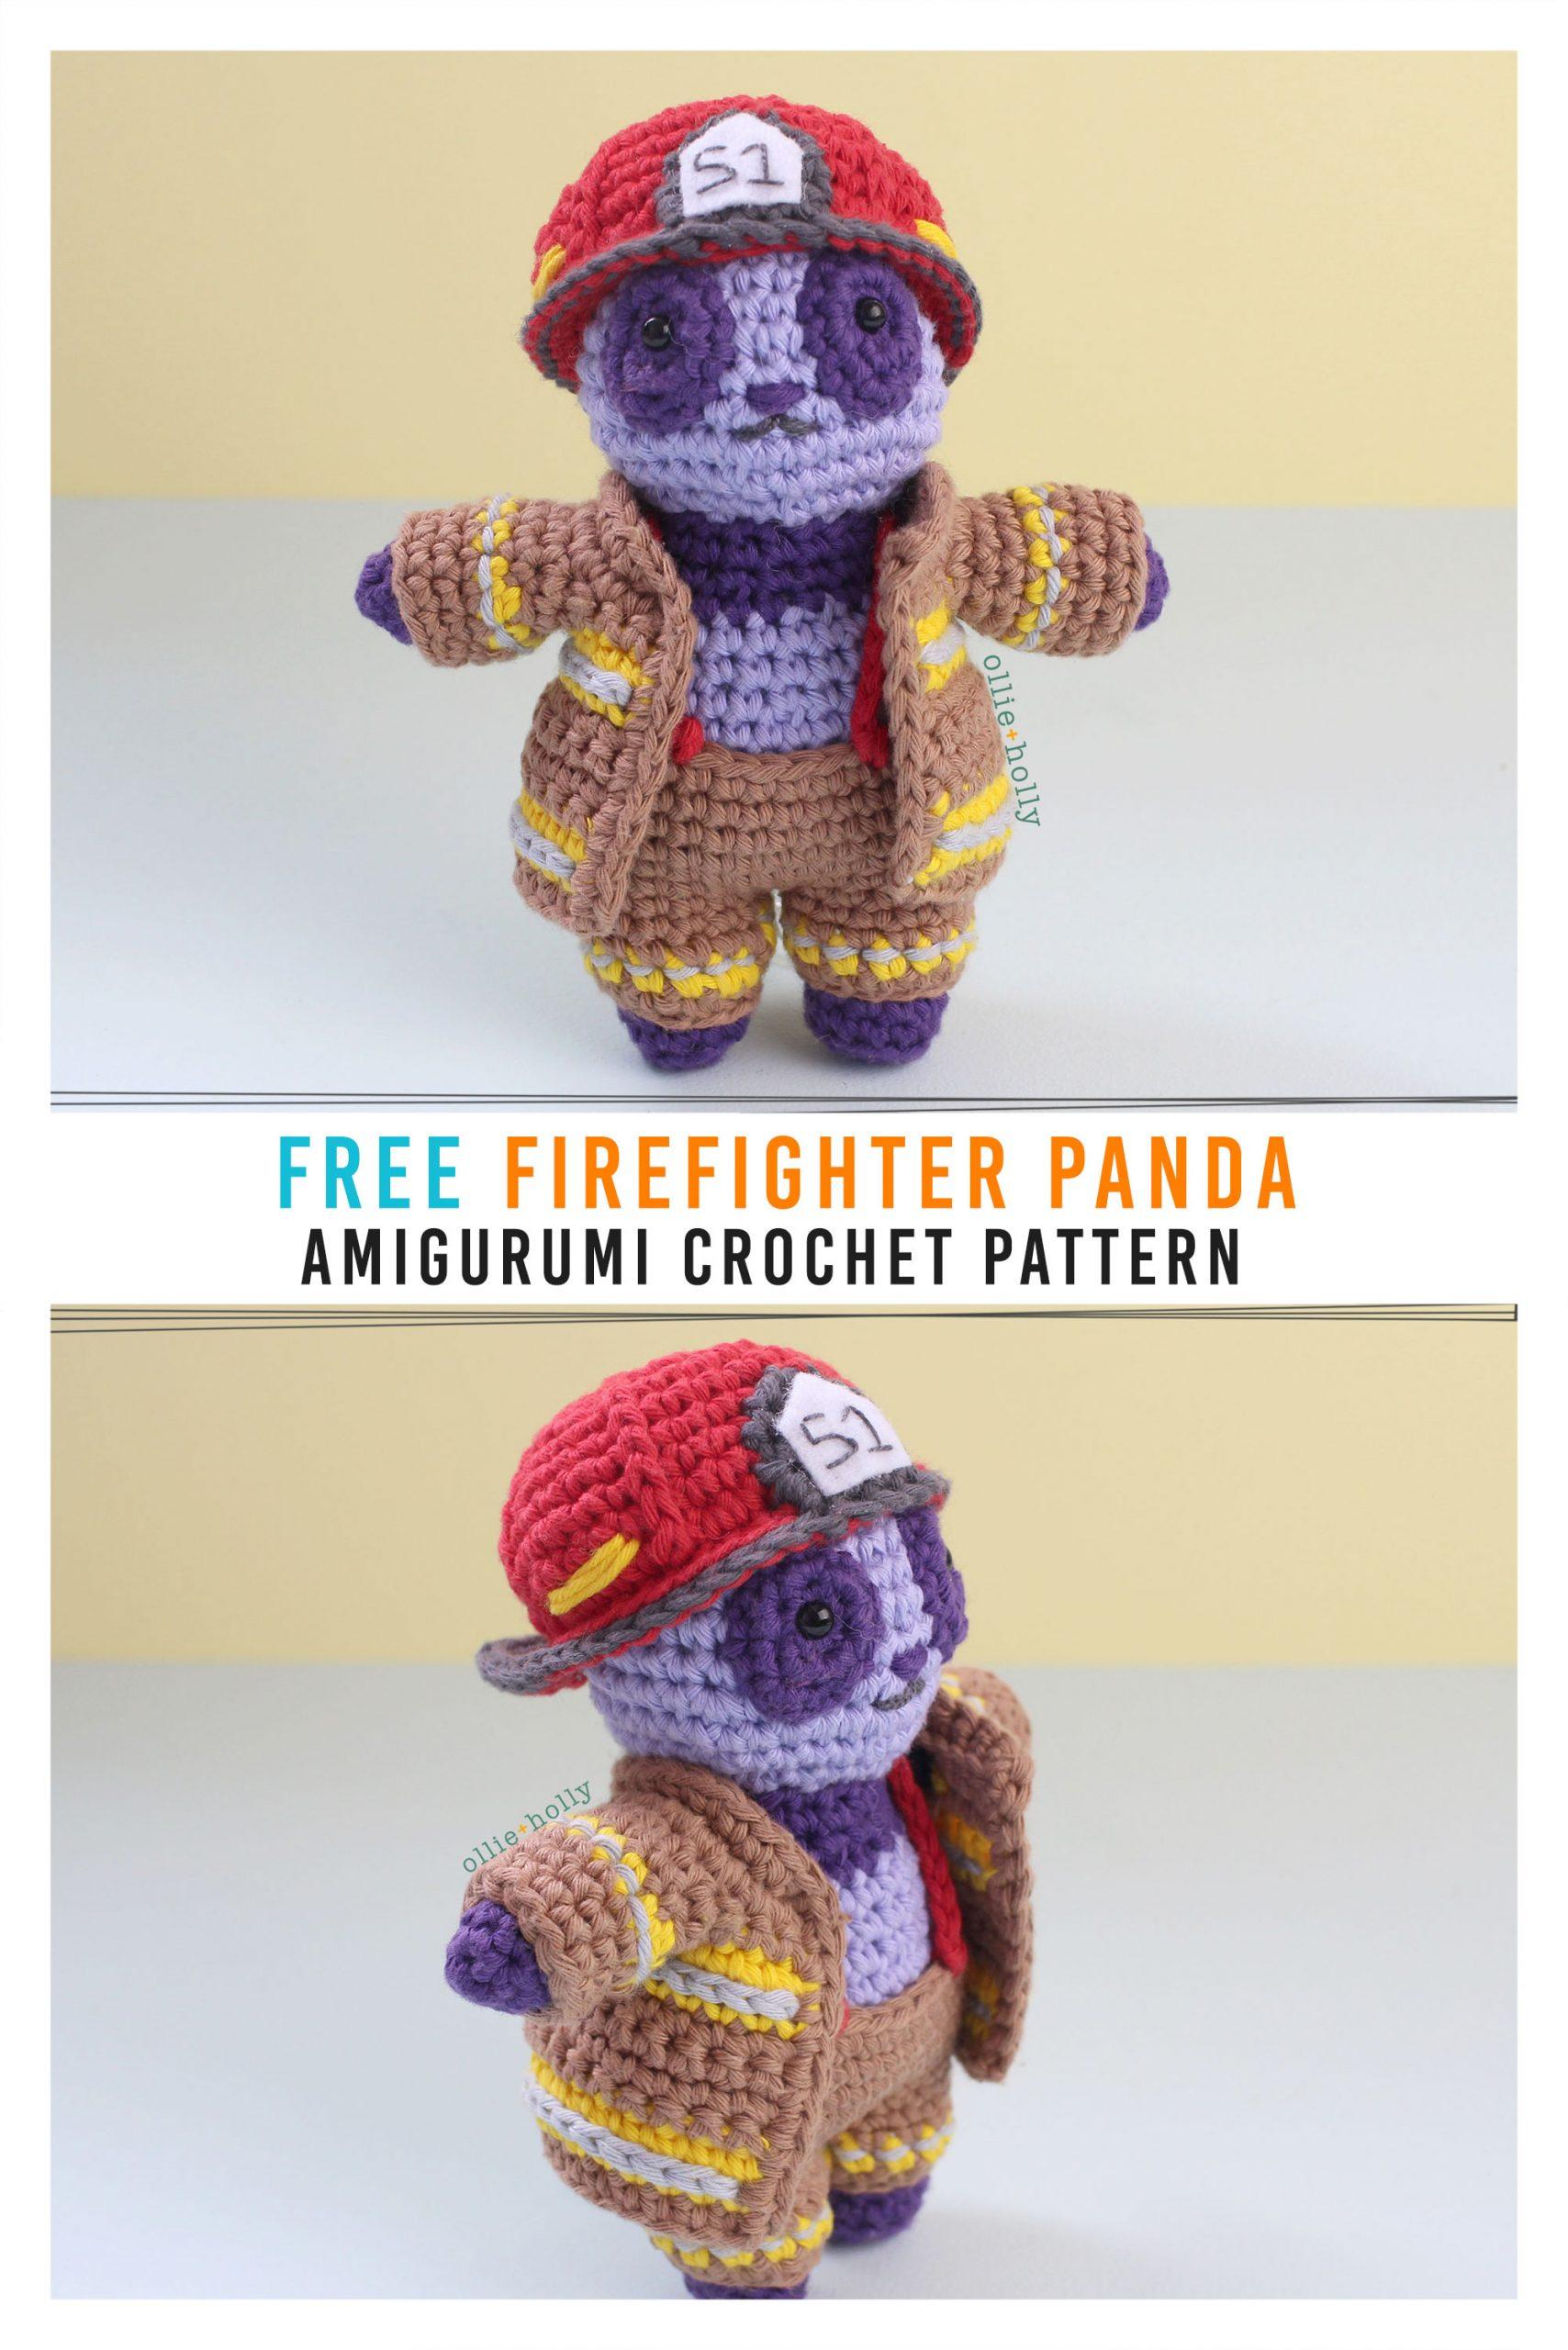 Free Firefighter Panda Stuffed Animal Amigurumi Crochet Pattern